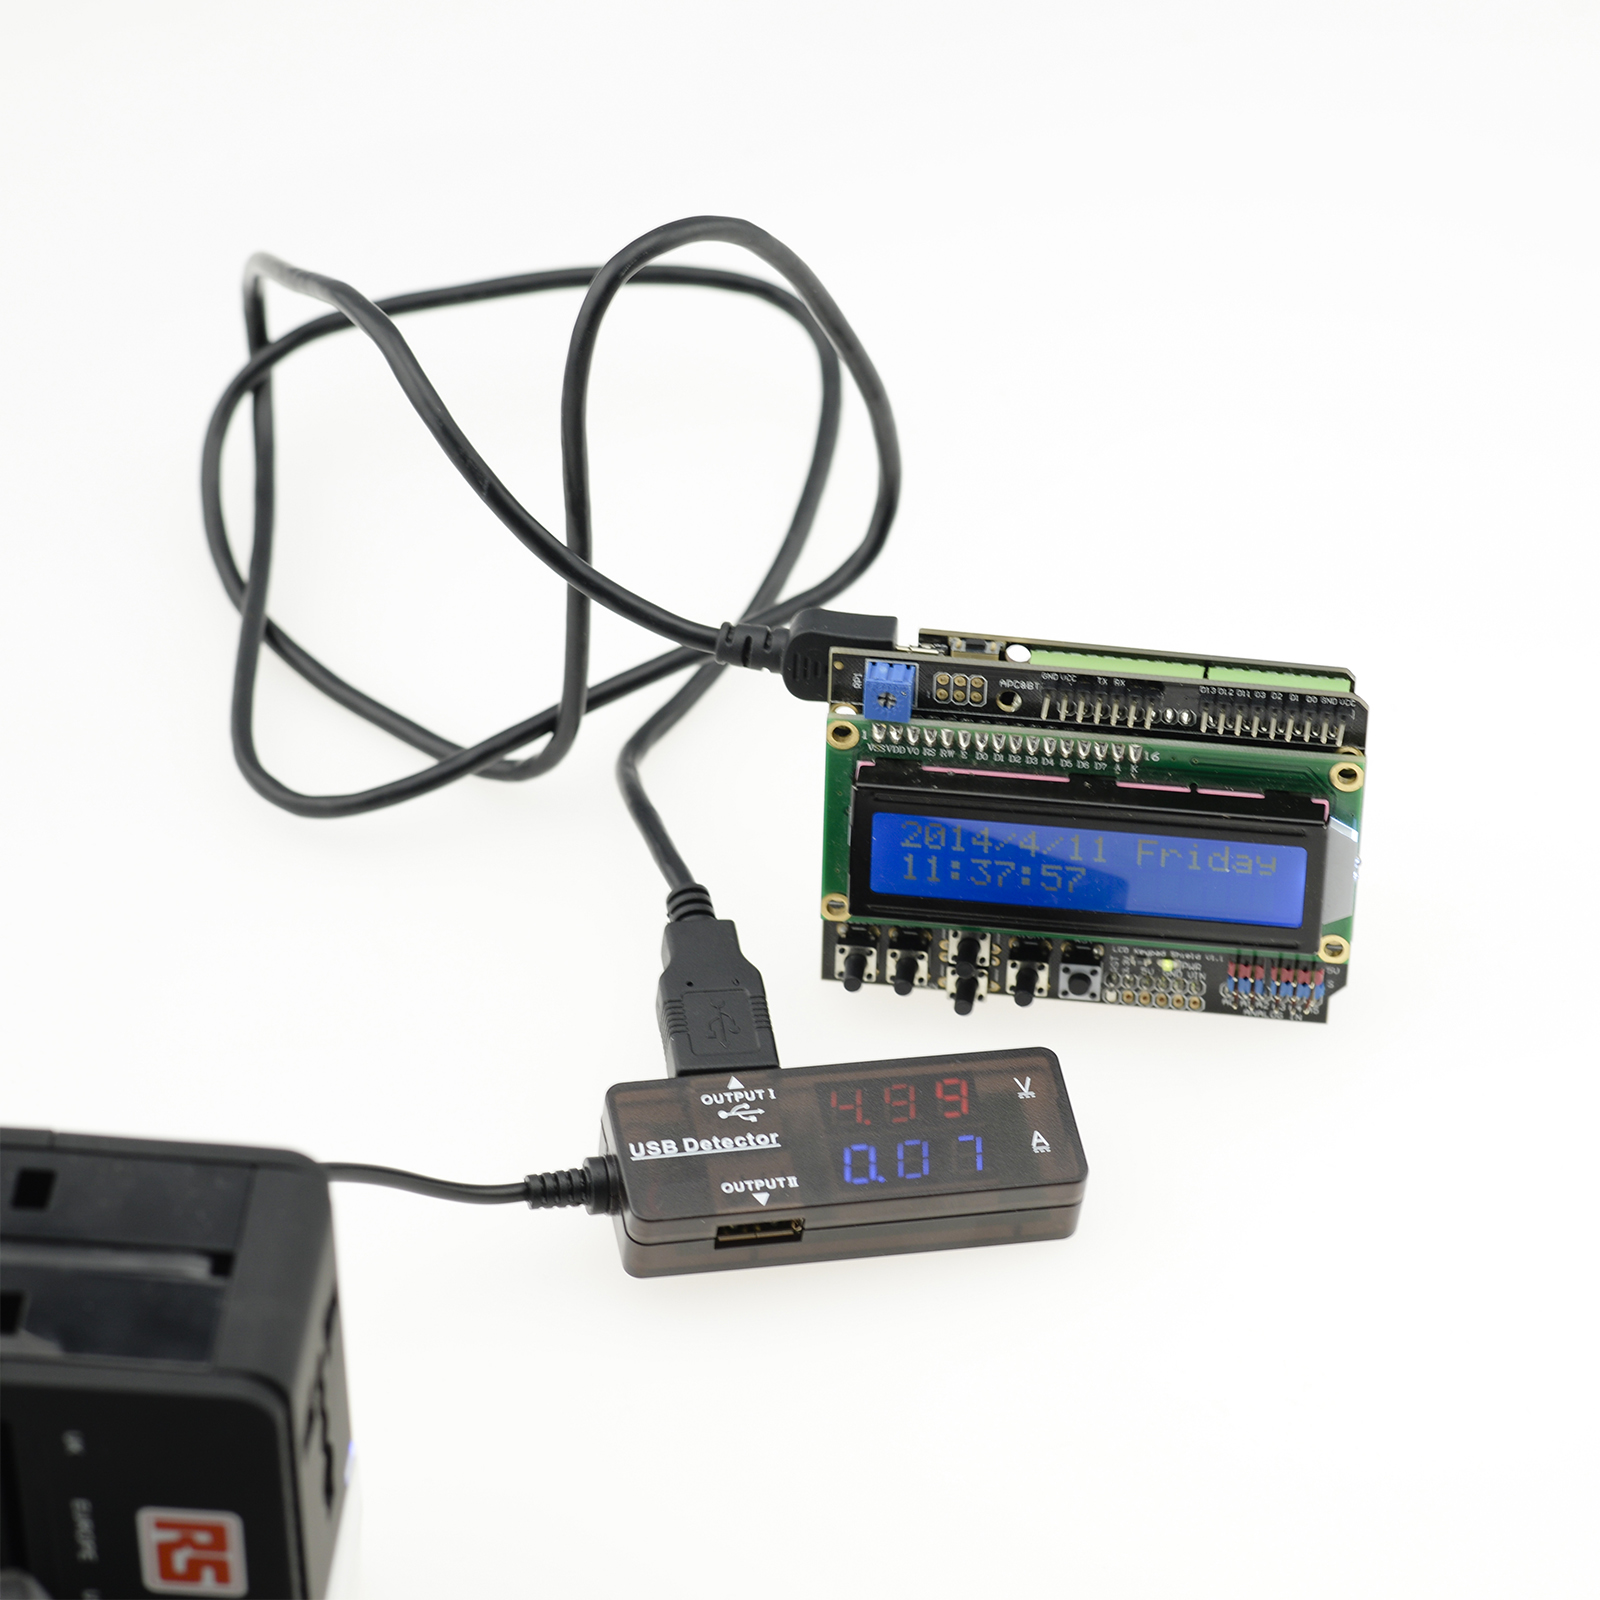 USB Power Detector displays charging voltage